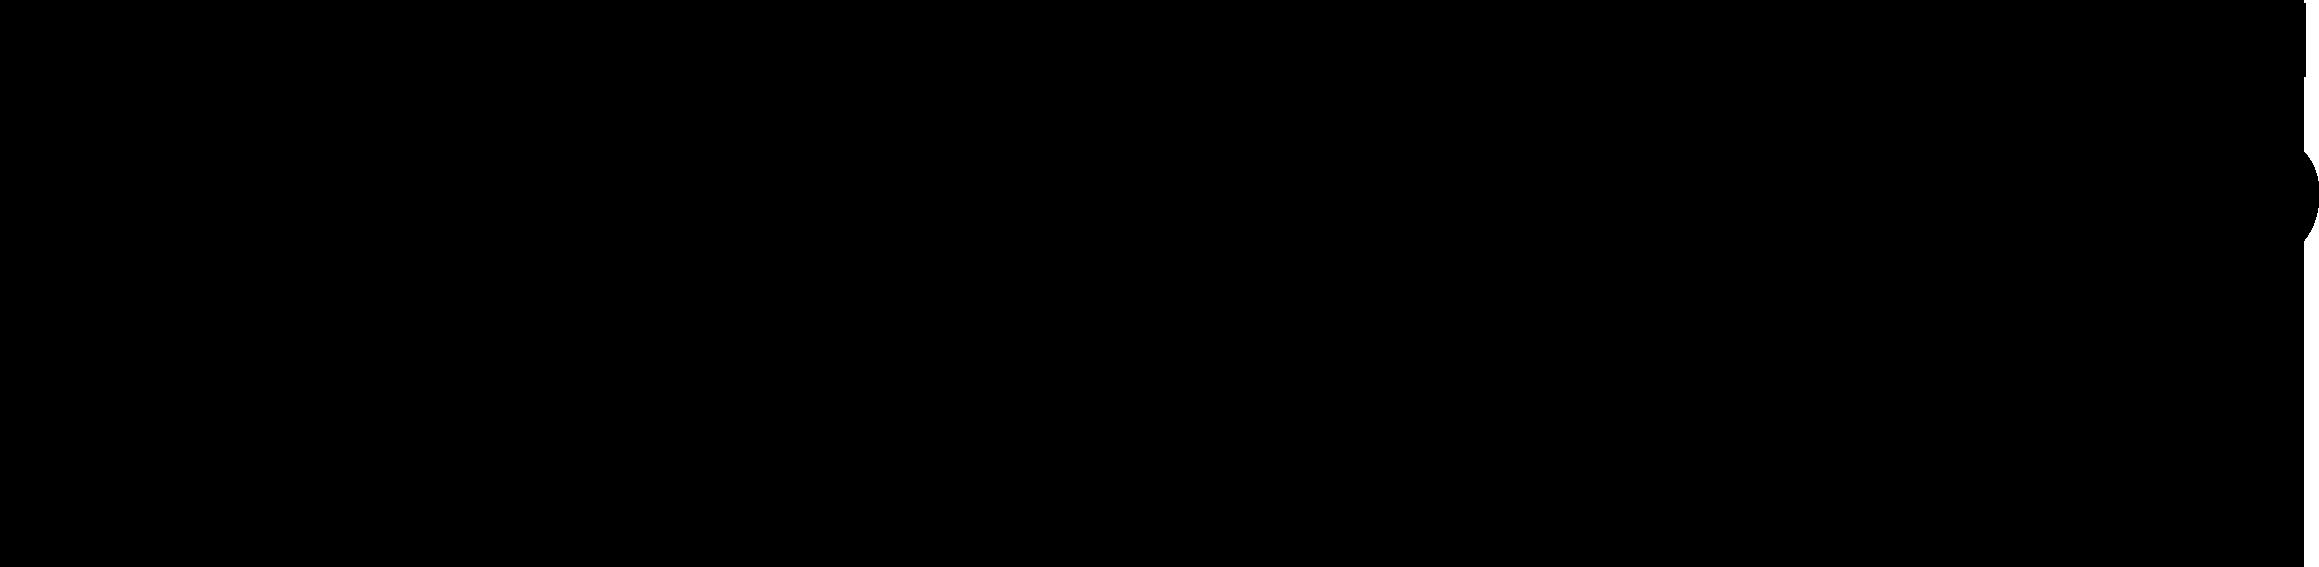 logo_betaplus_baseline 2.png